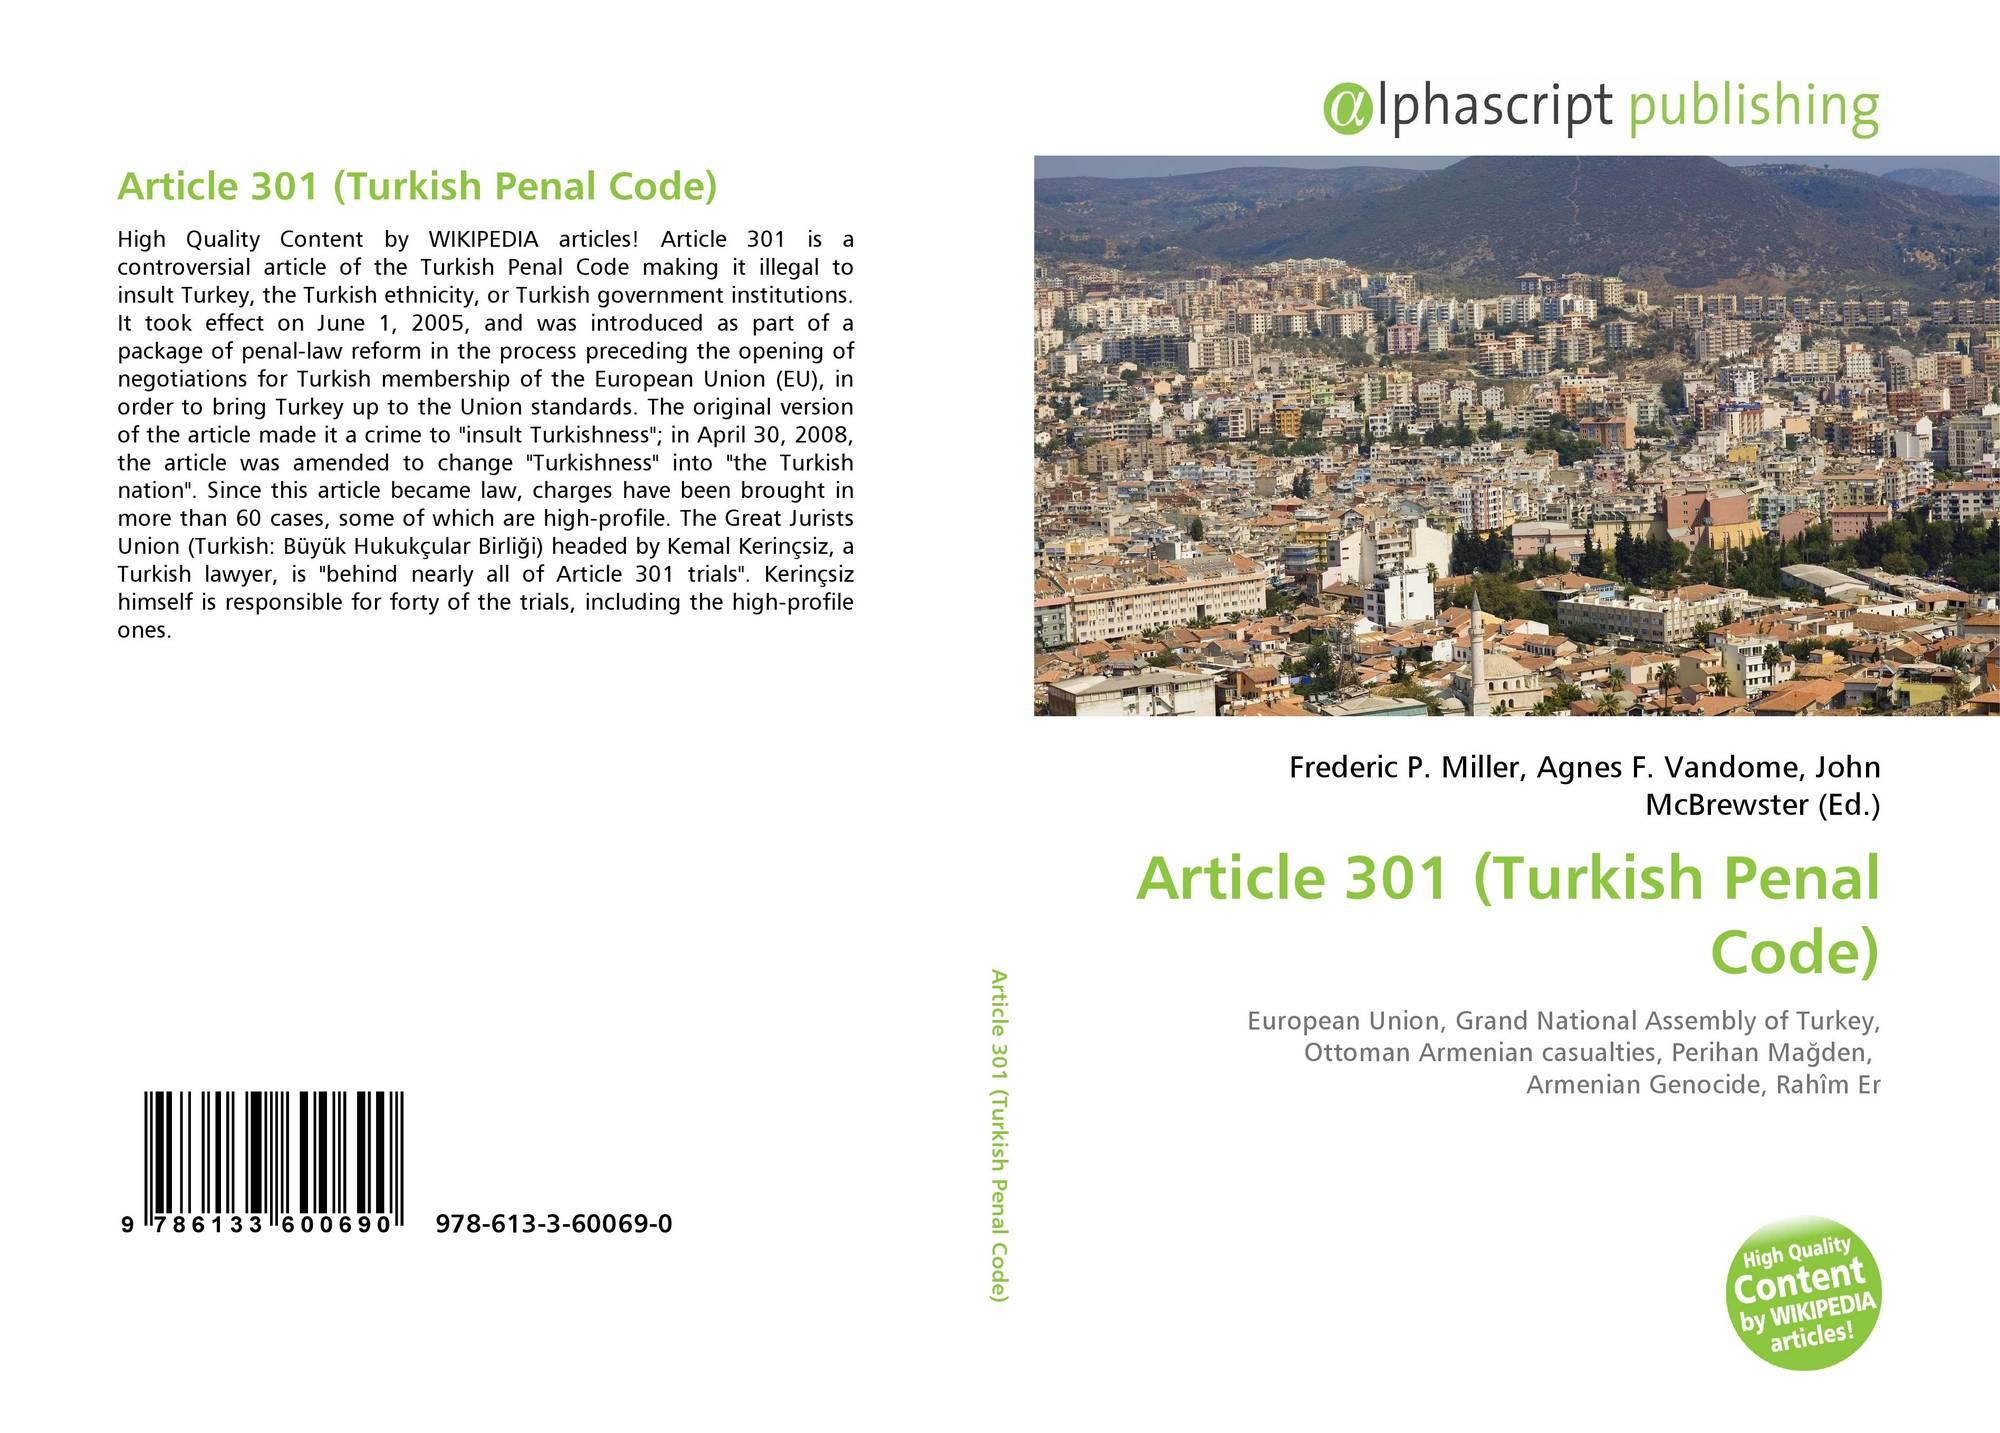 article 301 turkish penal code 2010